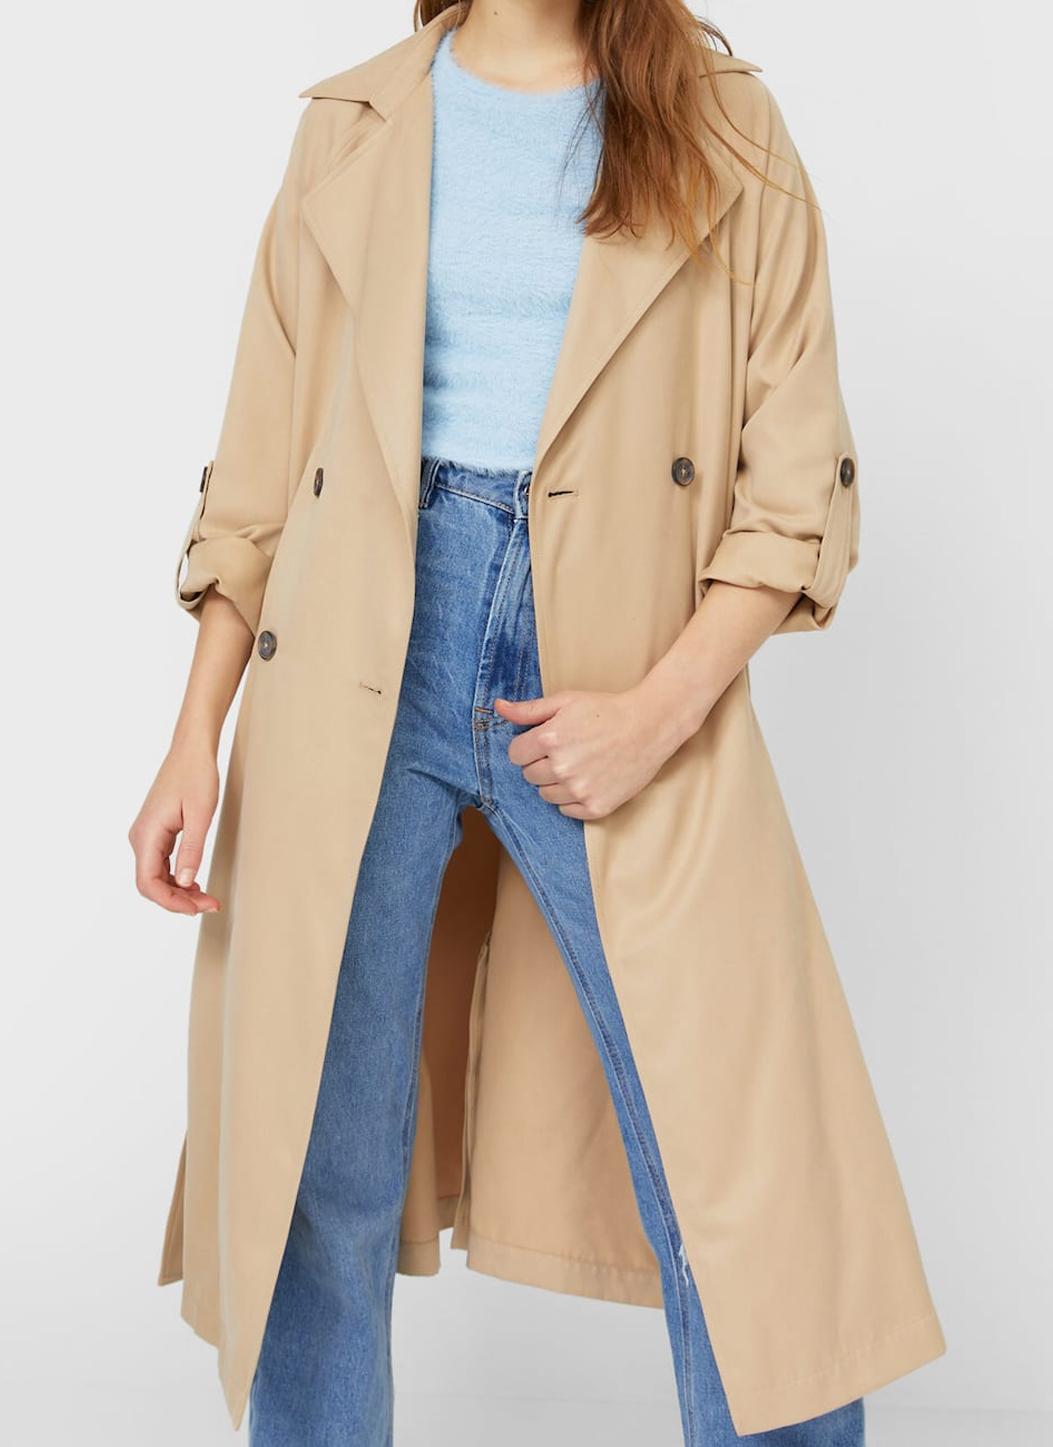 stradivarius beige trench coat